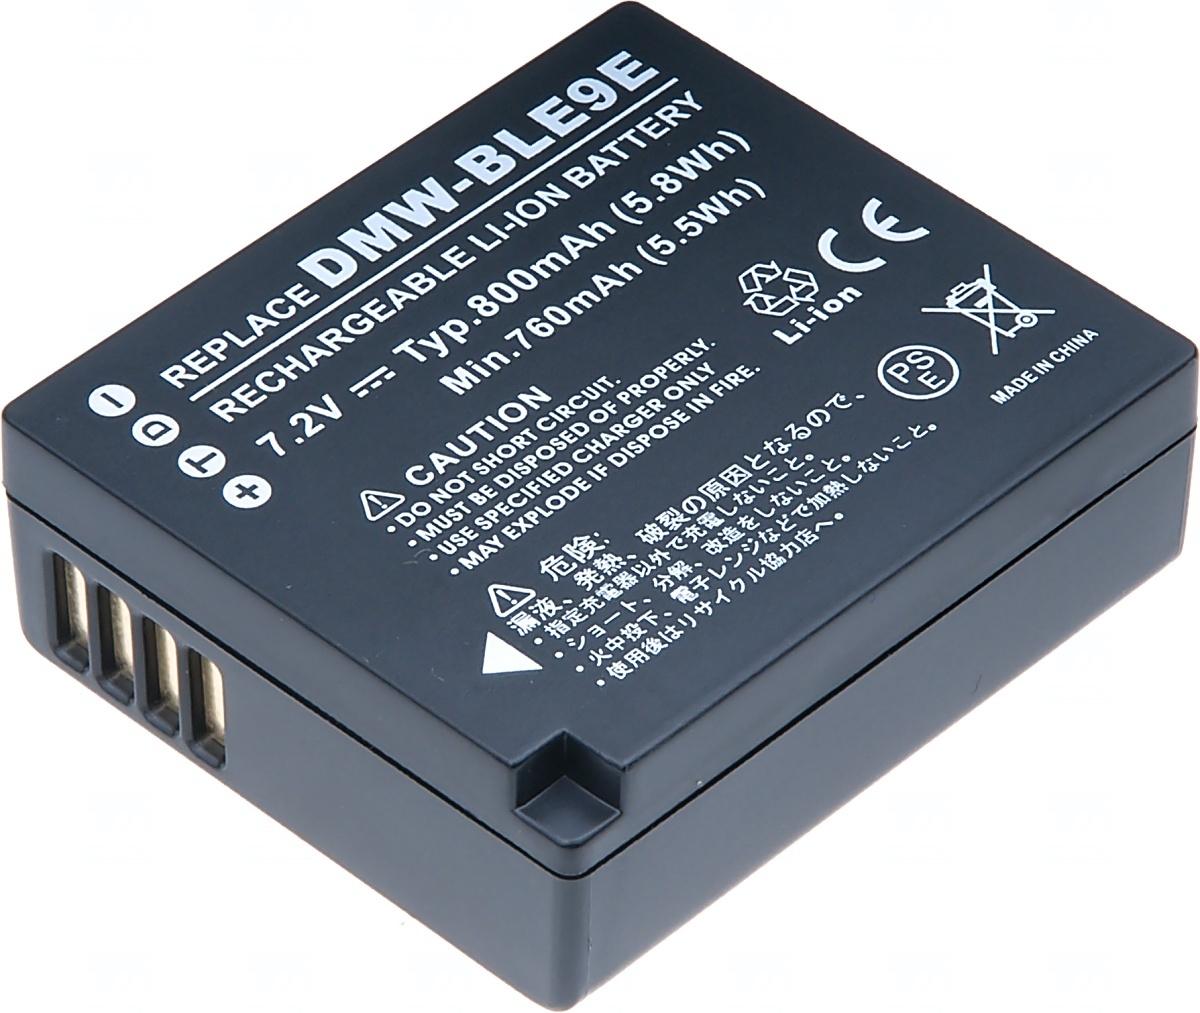 Baterie T6 power Panasonic DMW-BLE9, 800mAh, černá